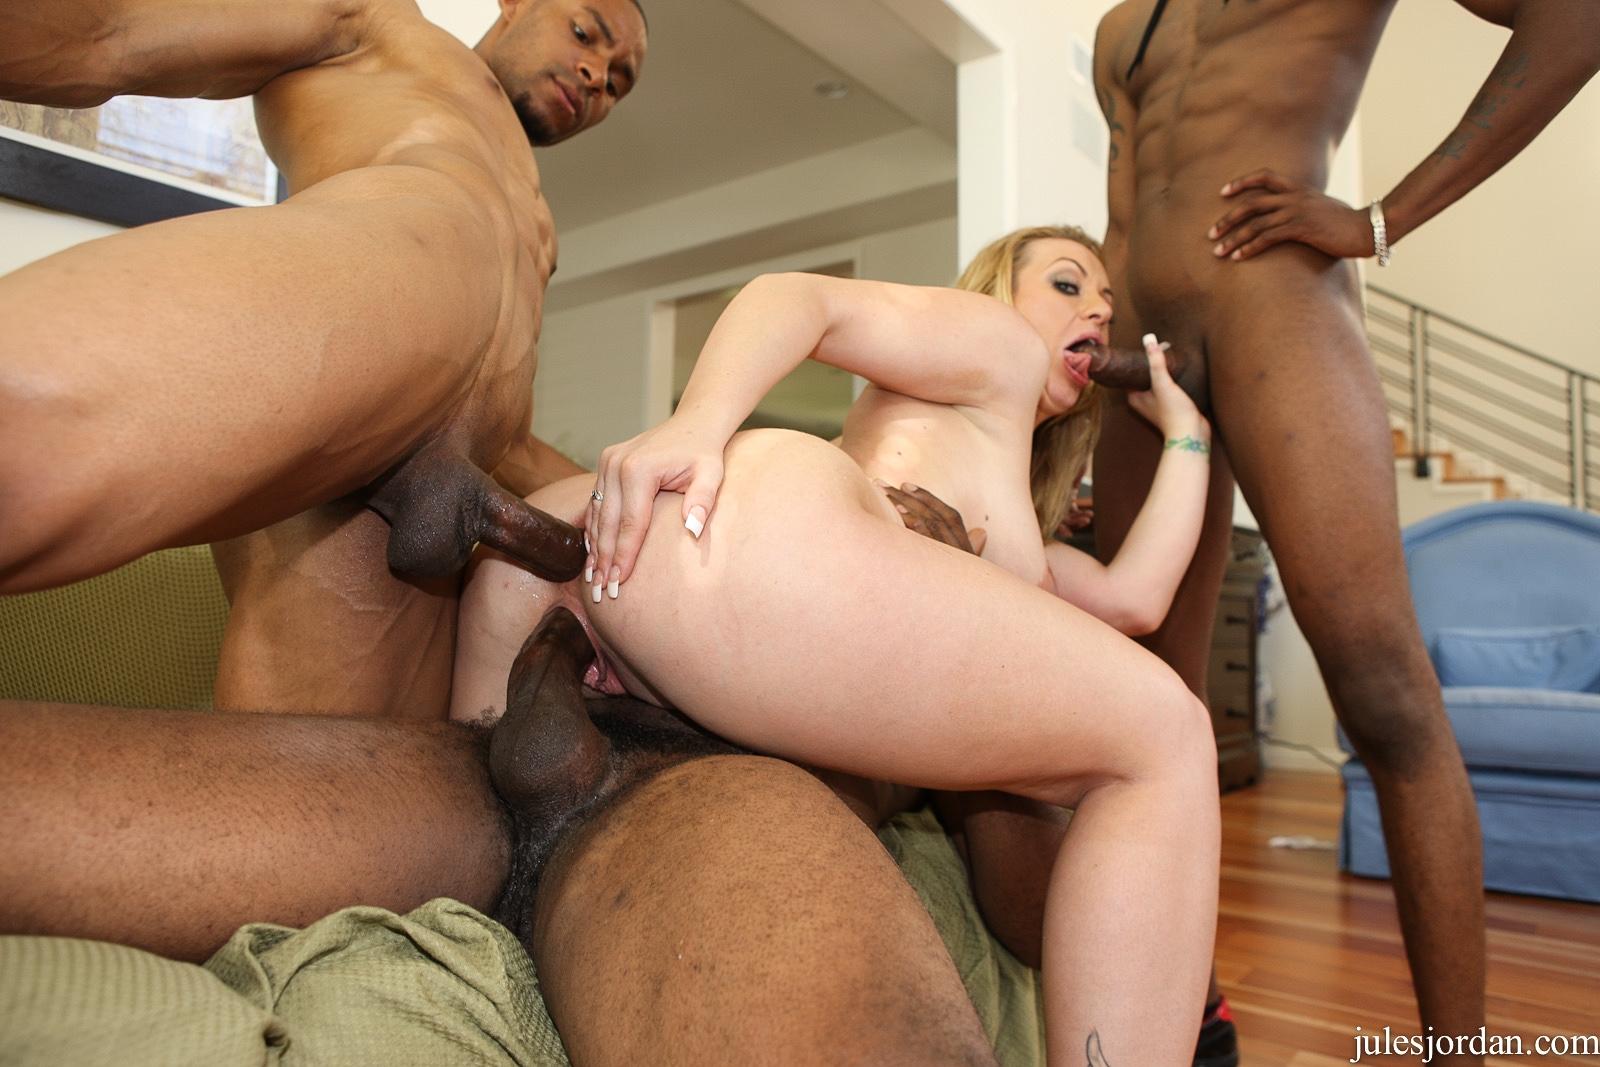 Kinky woman interracial dp action by huge black boners